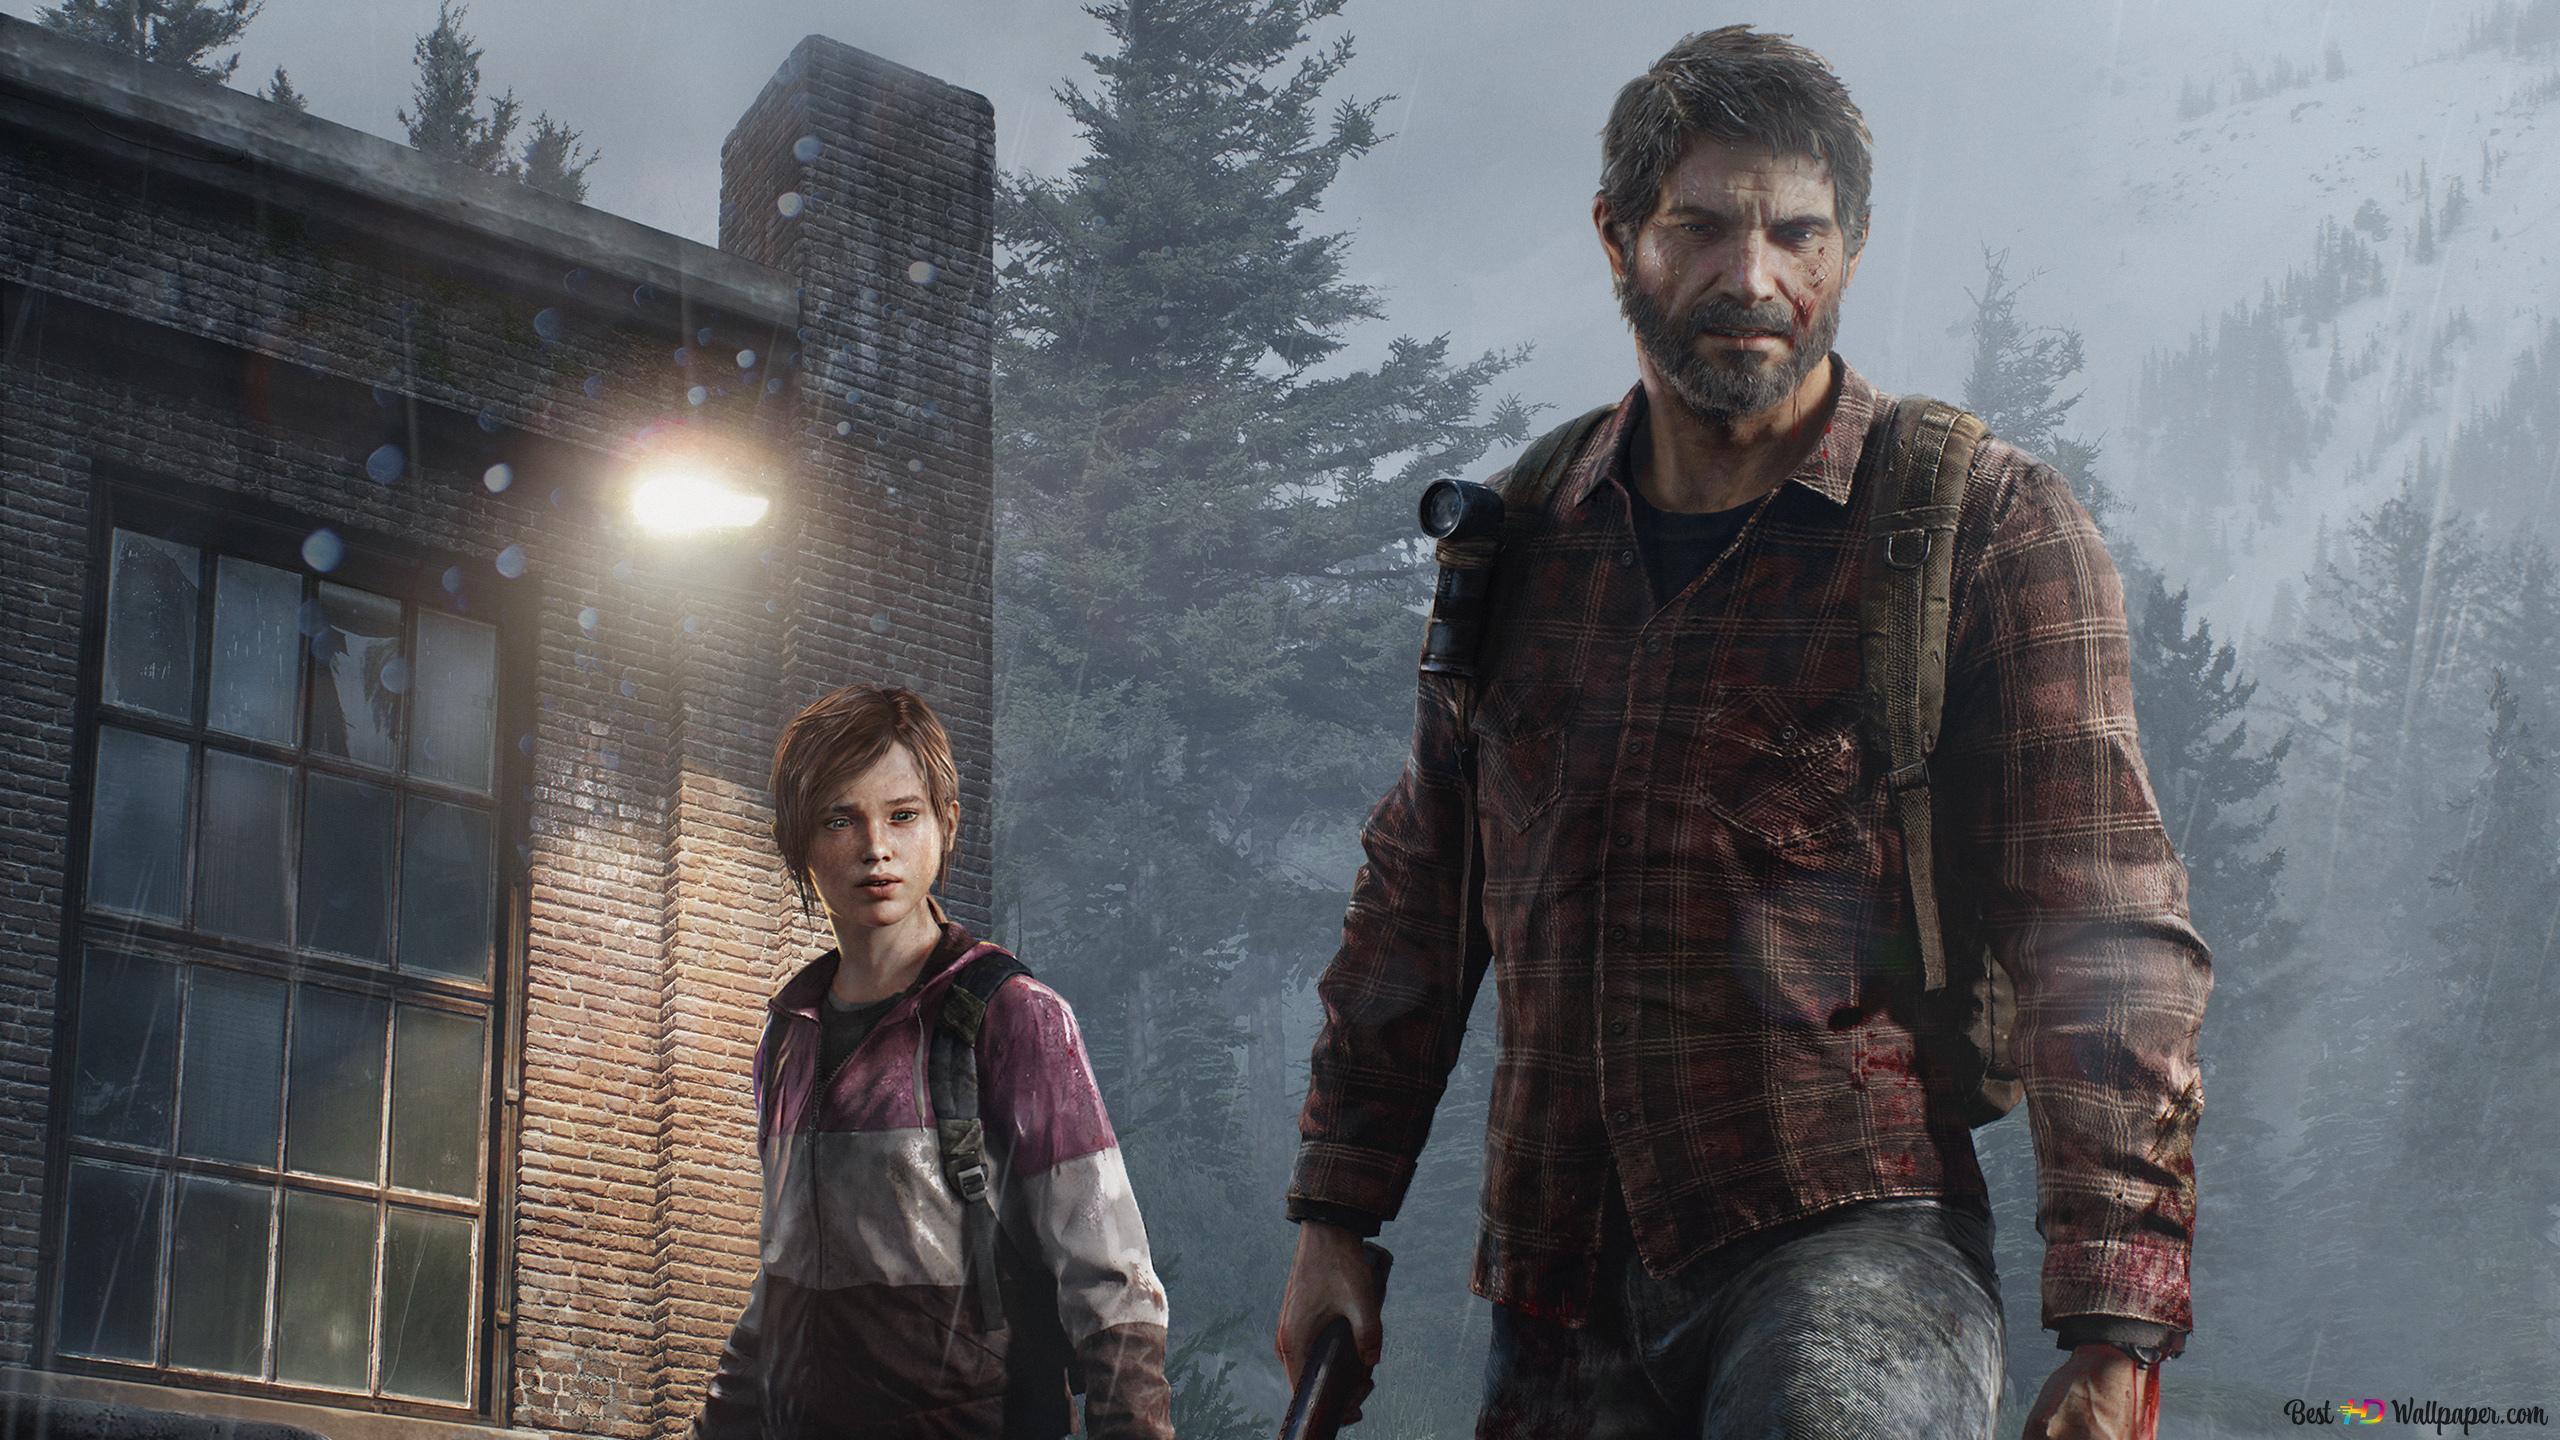 The Last Of Us Ellie And Joel Hd Wallpaper Download